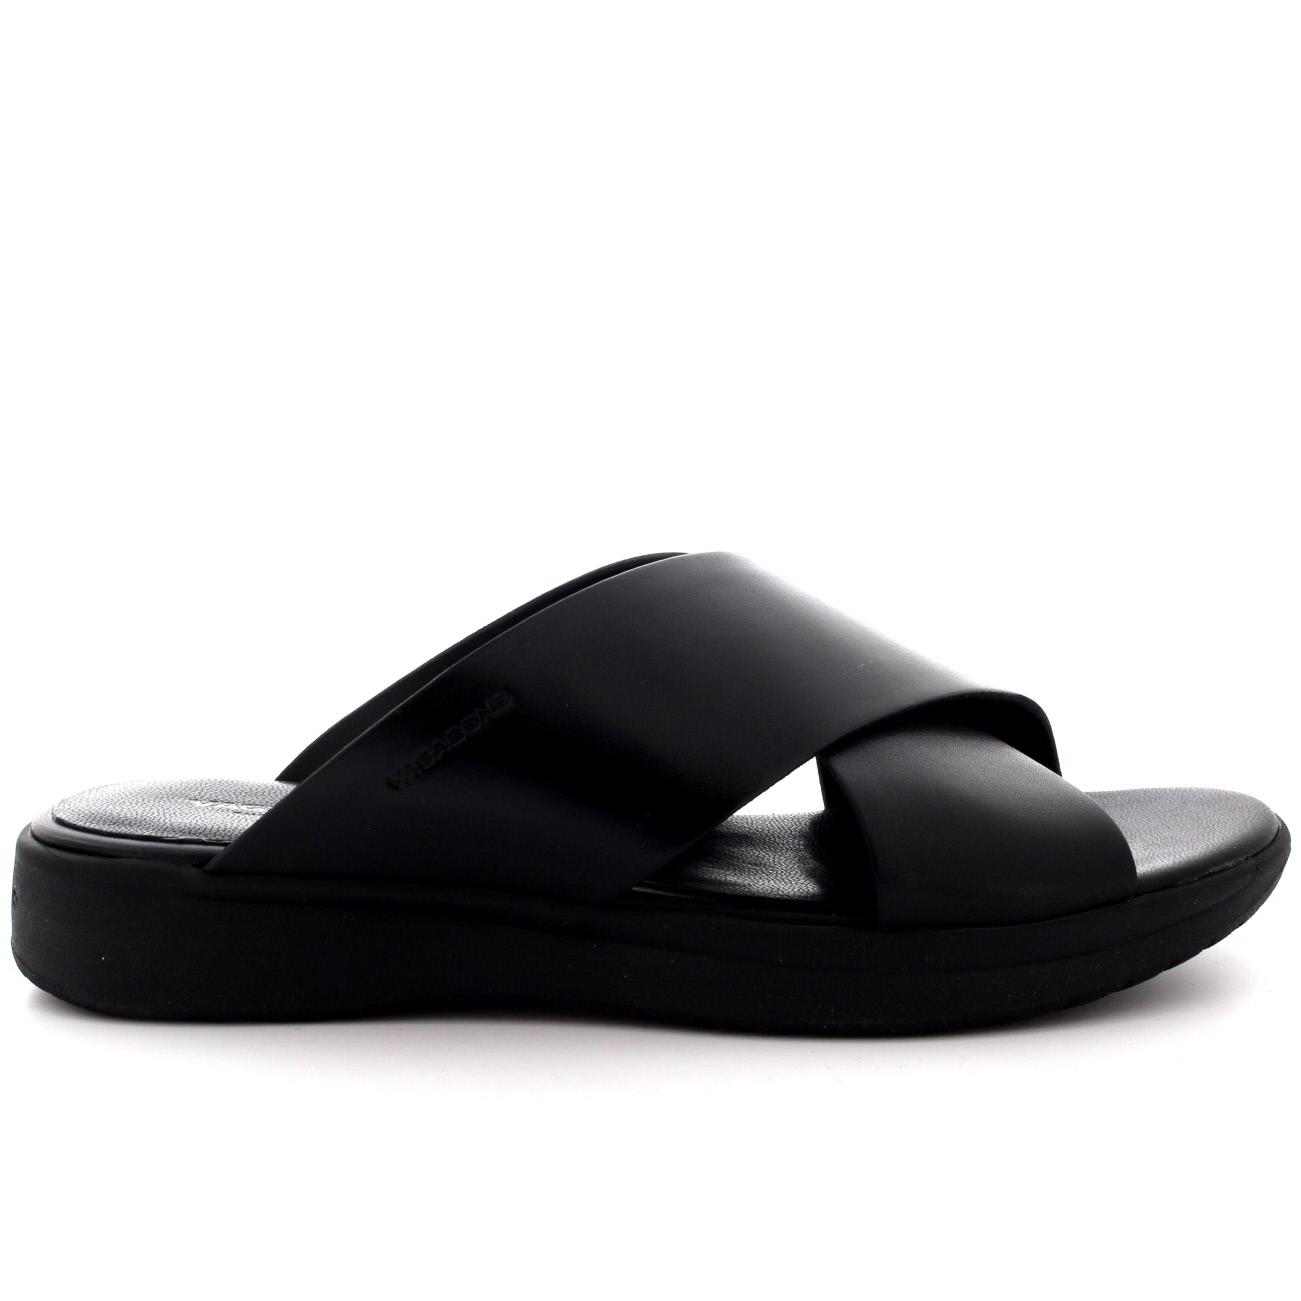 Black vagabond sandals - Womens Vagabond Lola Casual Flat Black Fashion Open Toe Leather Sandal Us 5 5 10